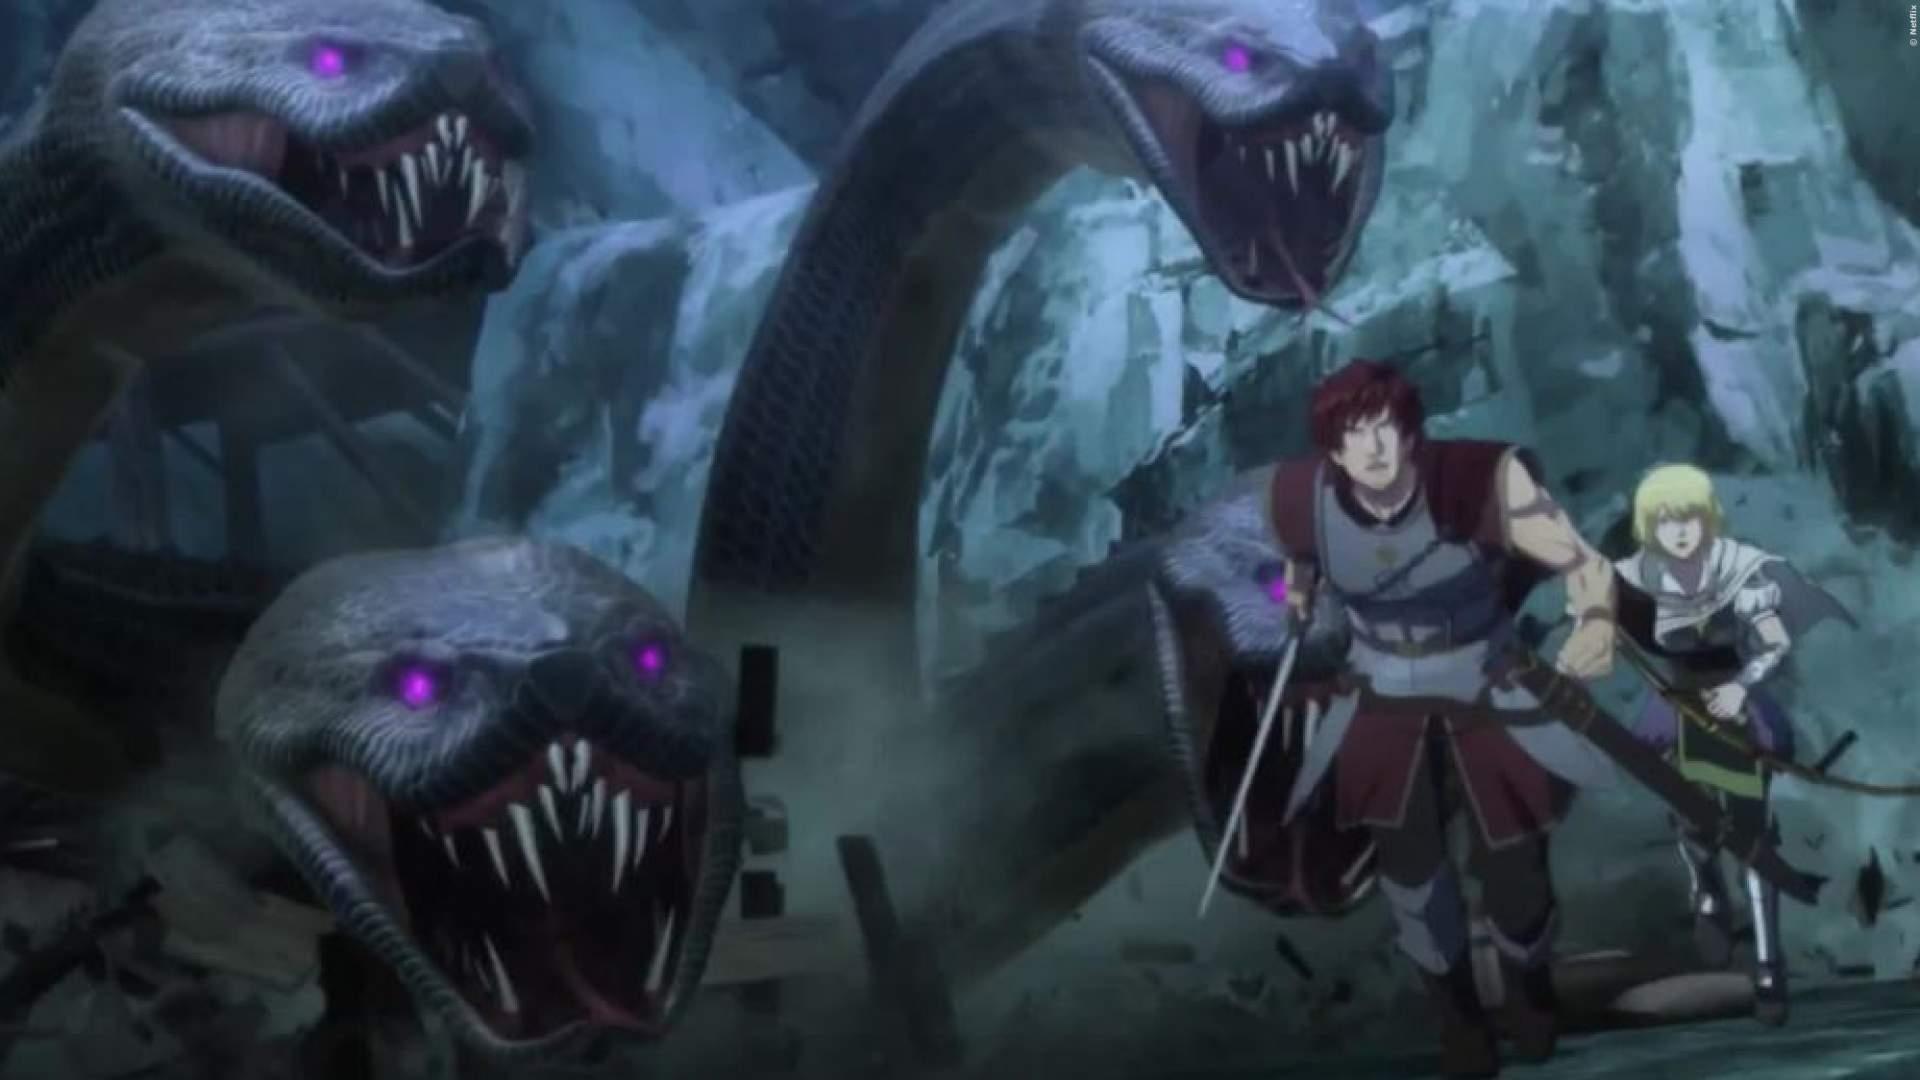 Netflix-Trailer zur Animé-Serie 'Dragon's Dogma' macht euch Gänsehaut